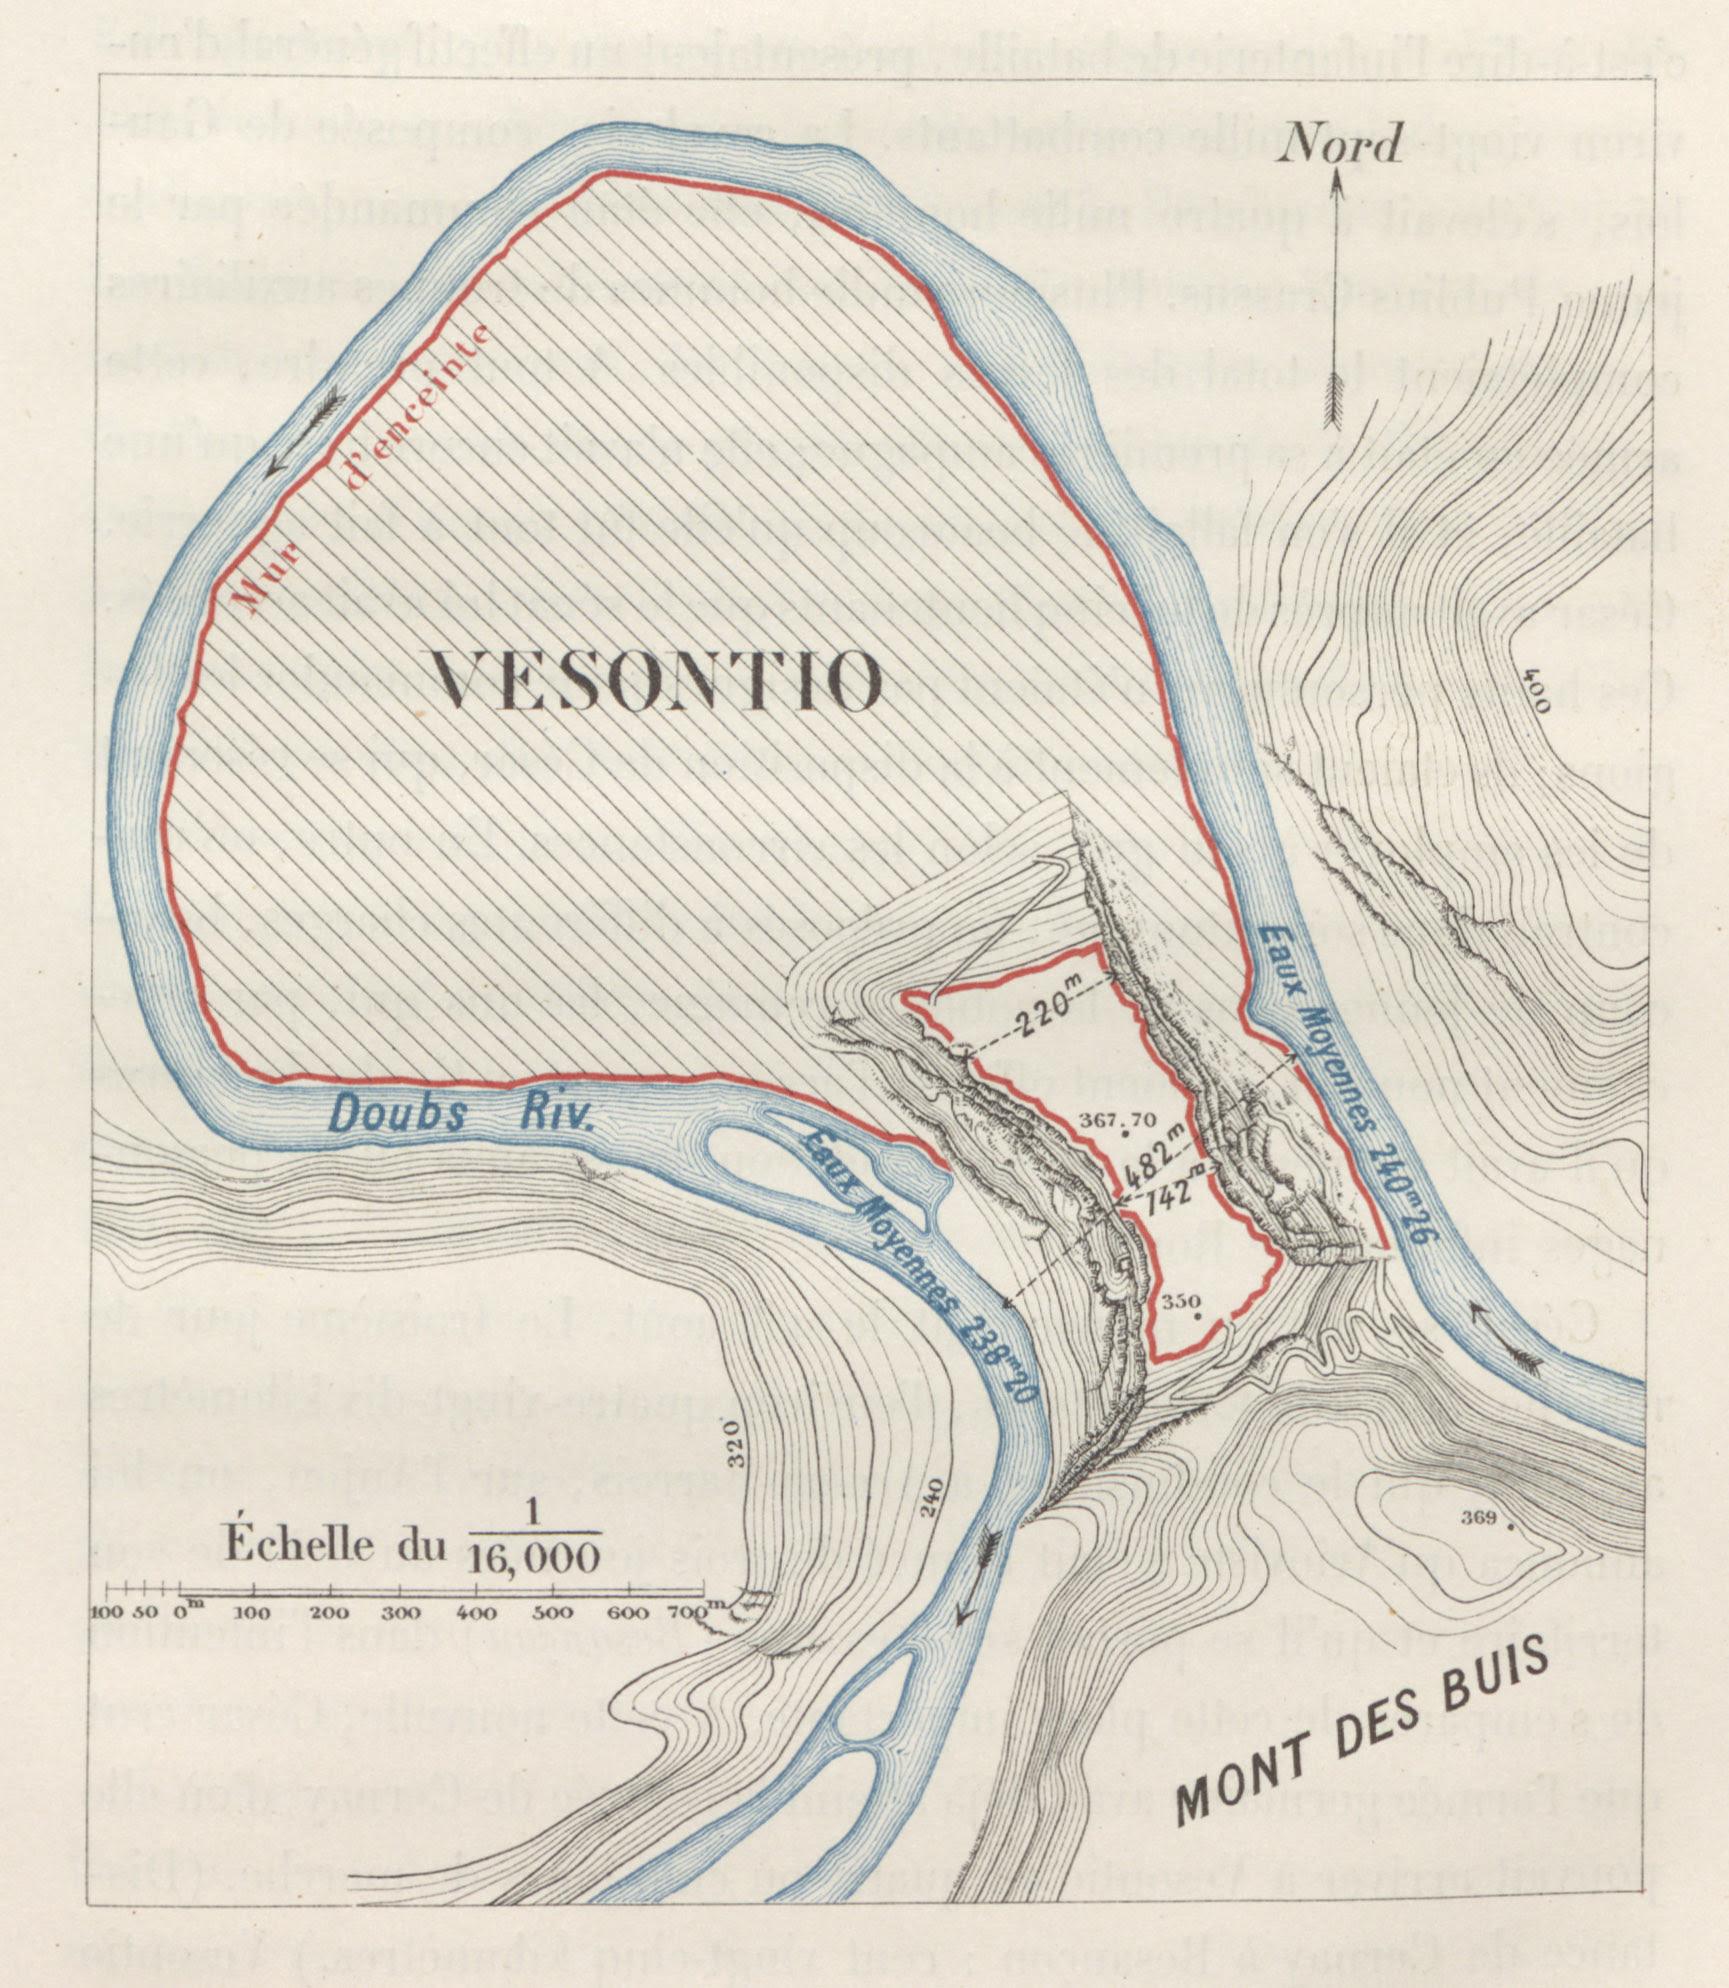 Eugene Stoffel's map of Vesontio